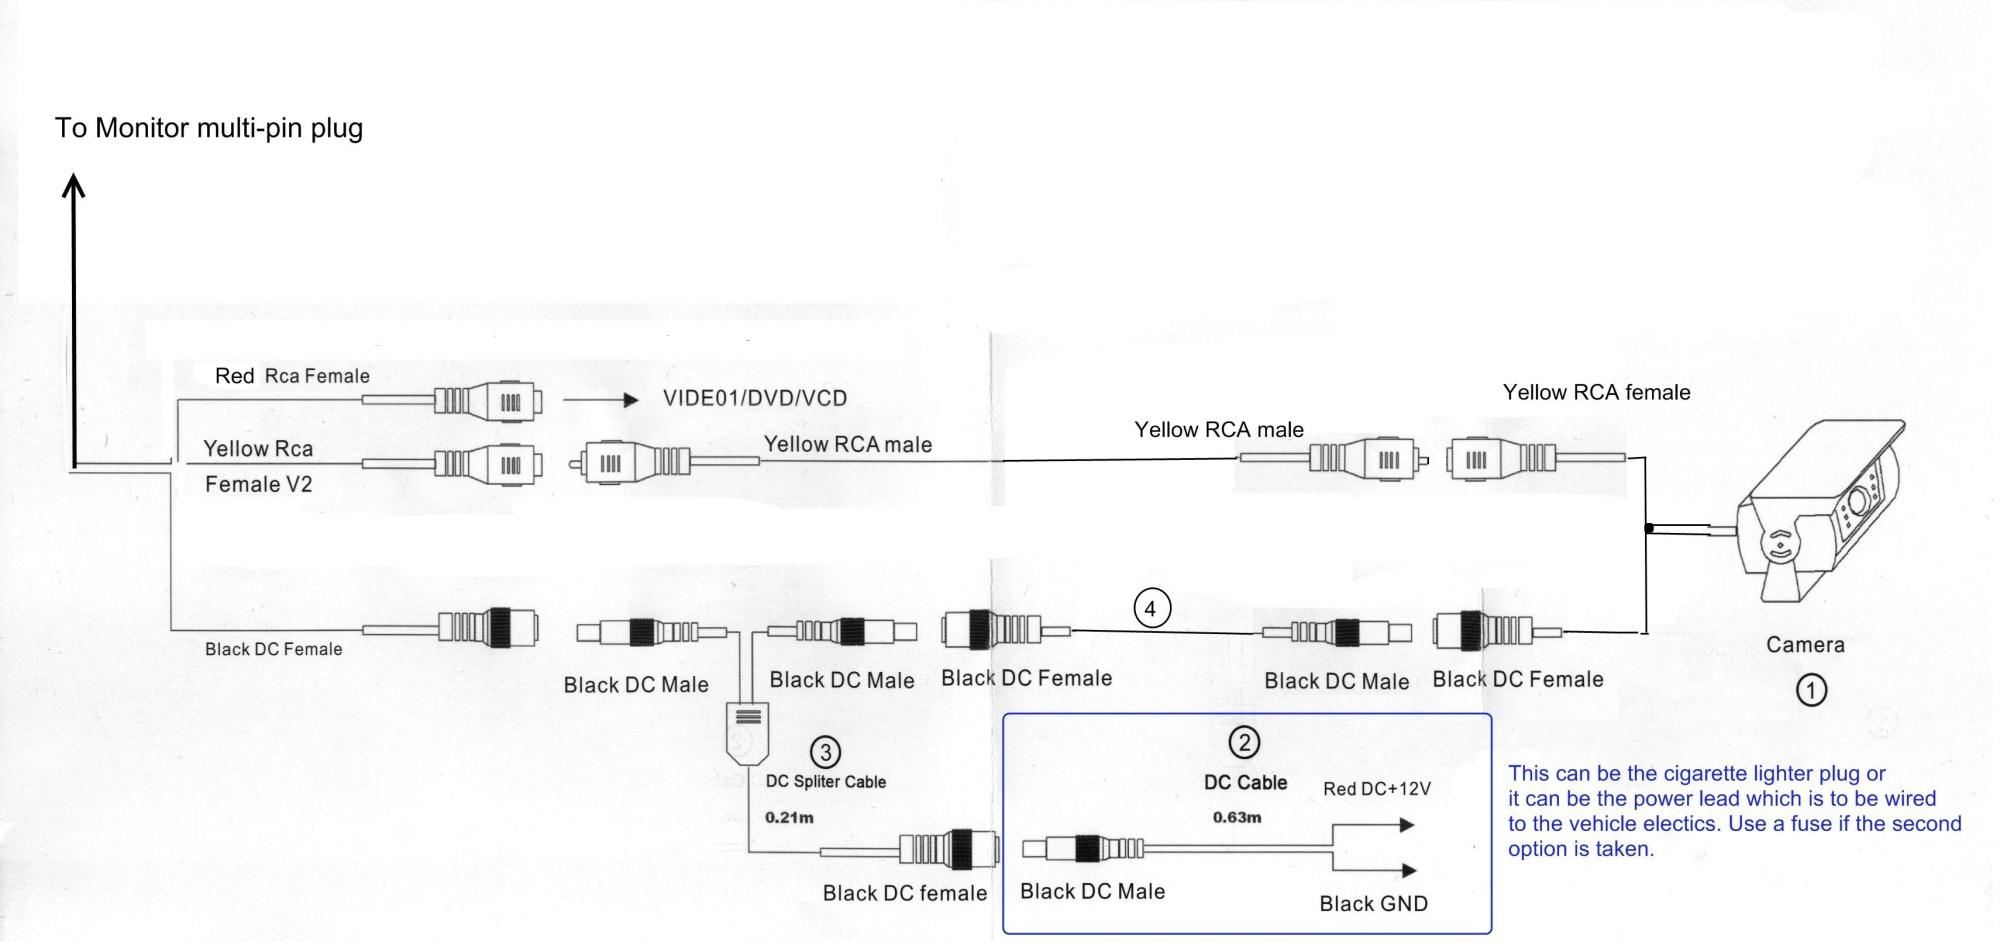 hight resolution of voyager camera wiring diagram gallery wiring diagram sample 2006 chrysler 300 fuse diagram voyager camera wiring